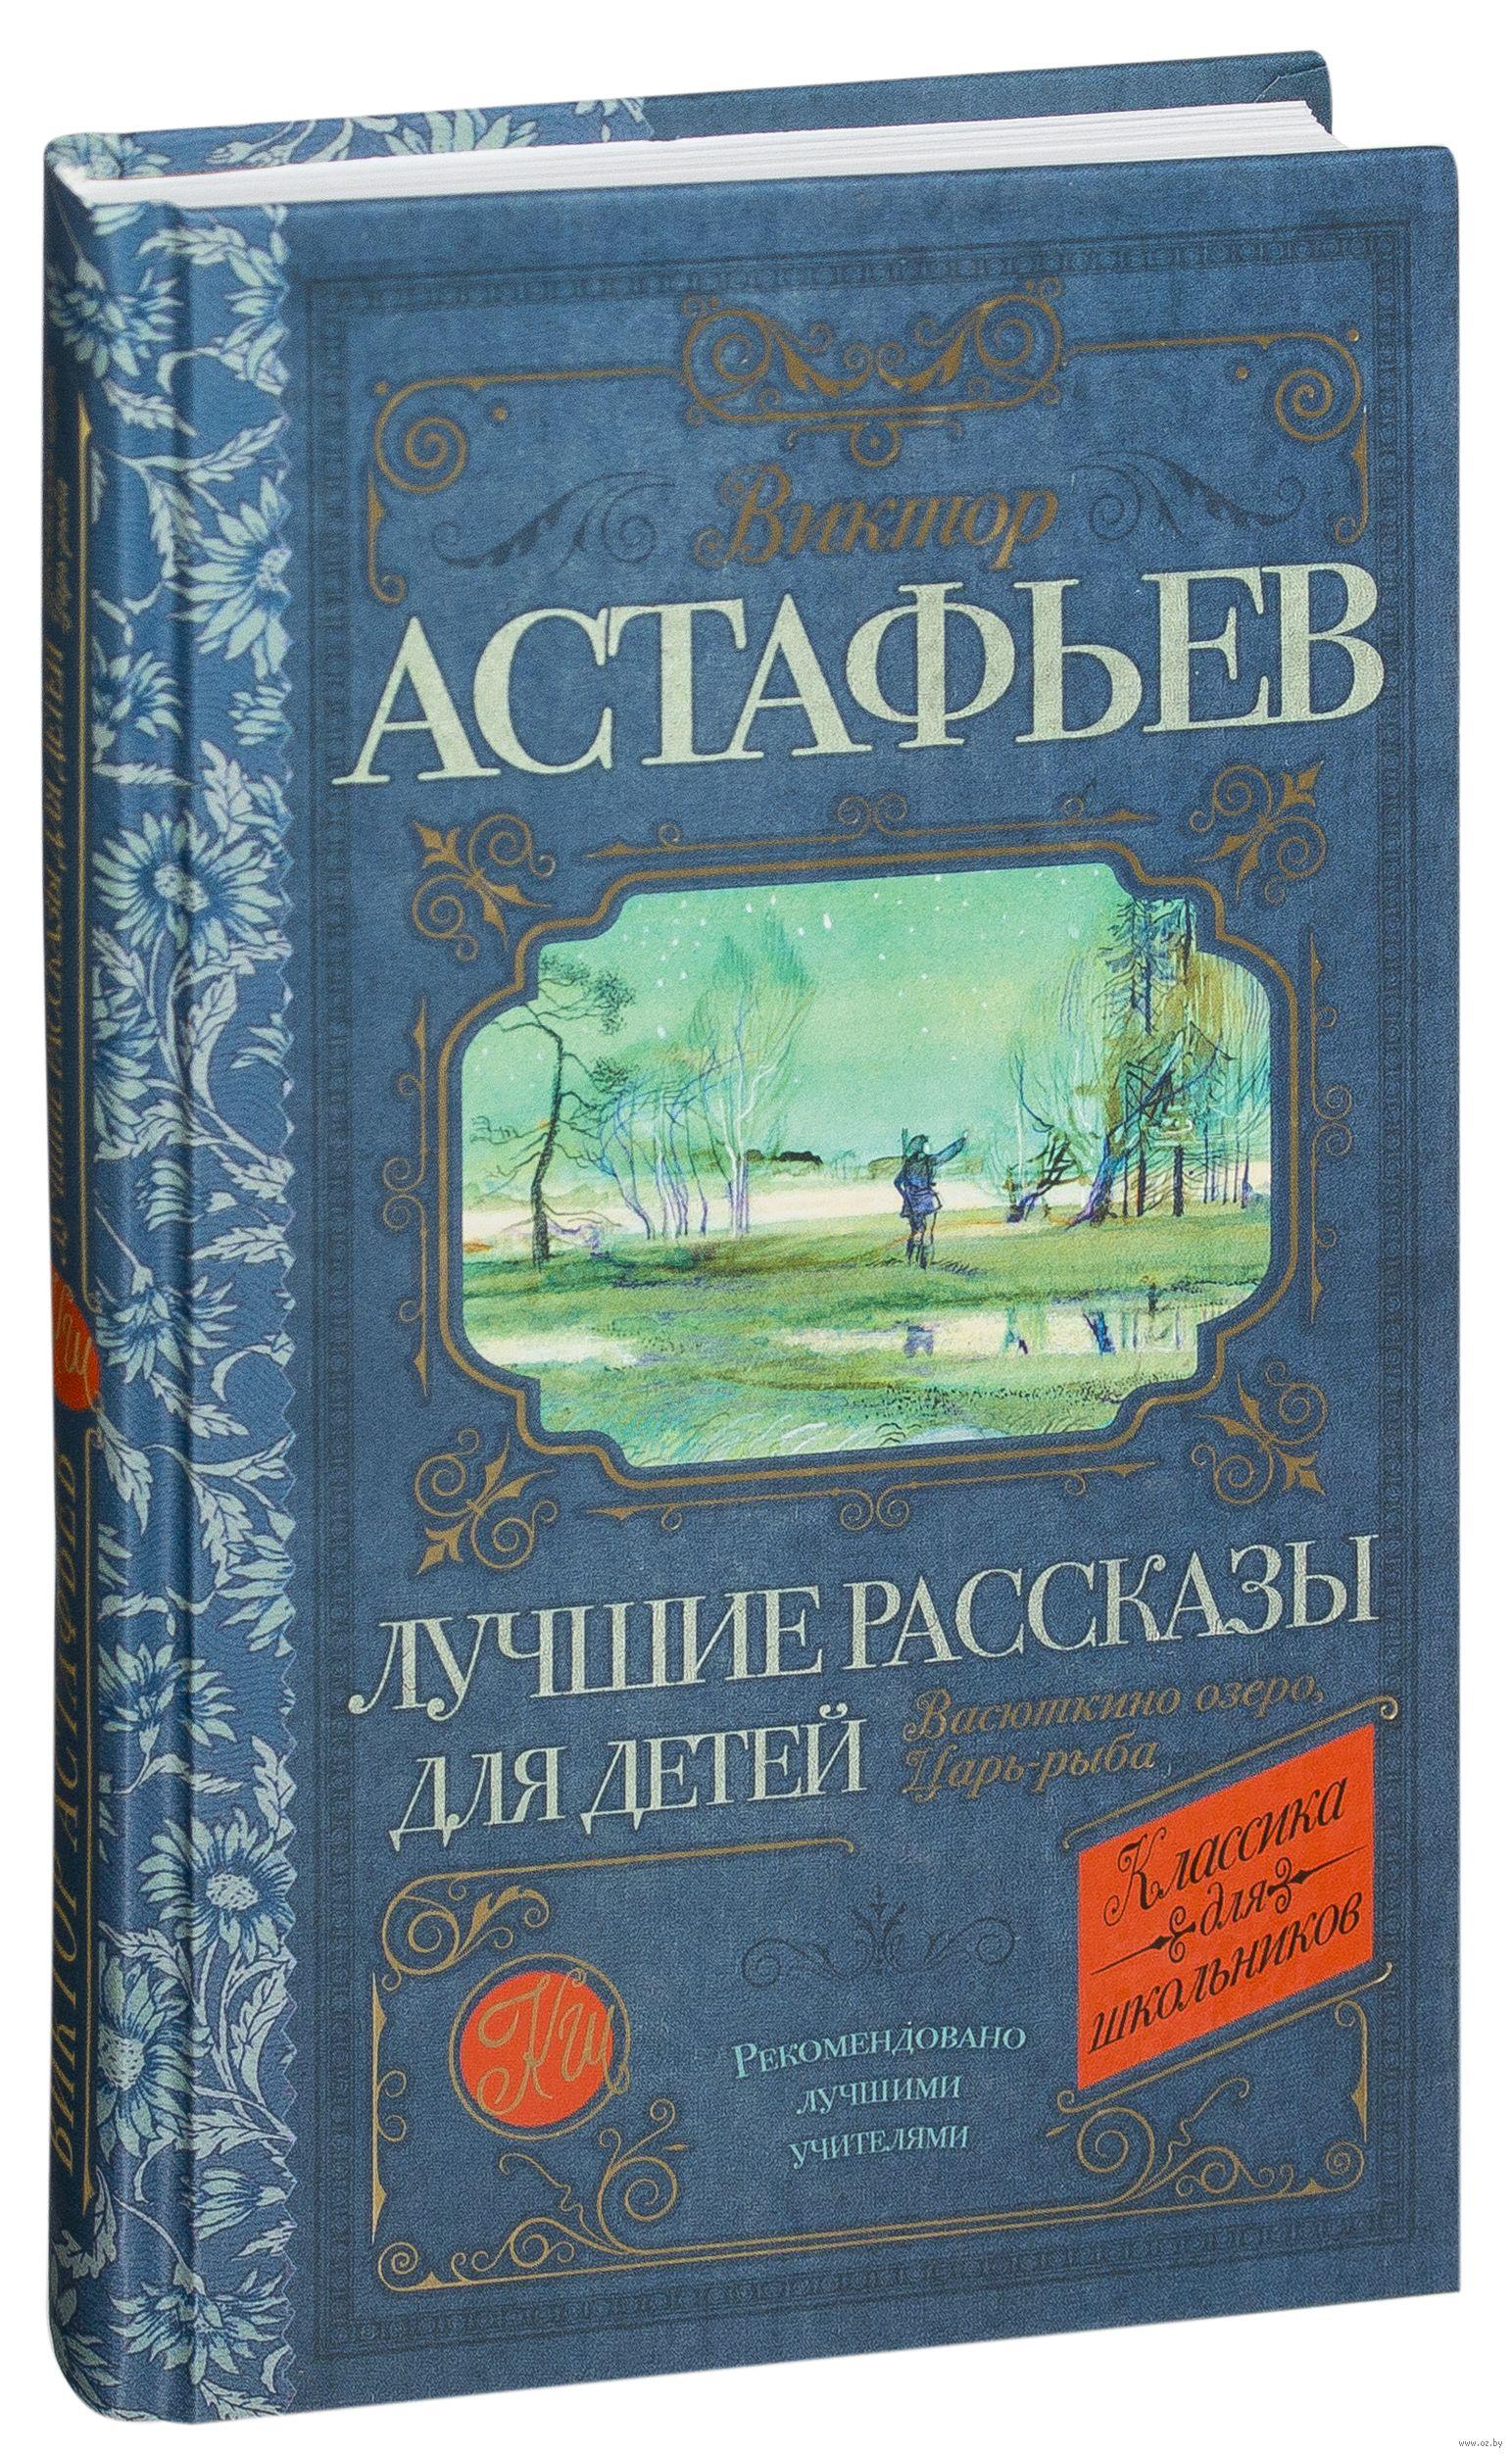 проектах виктор астафьев картинки книг два года оплачивал